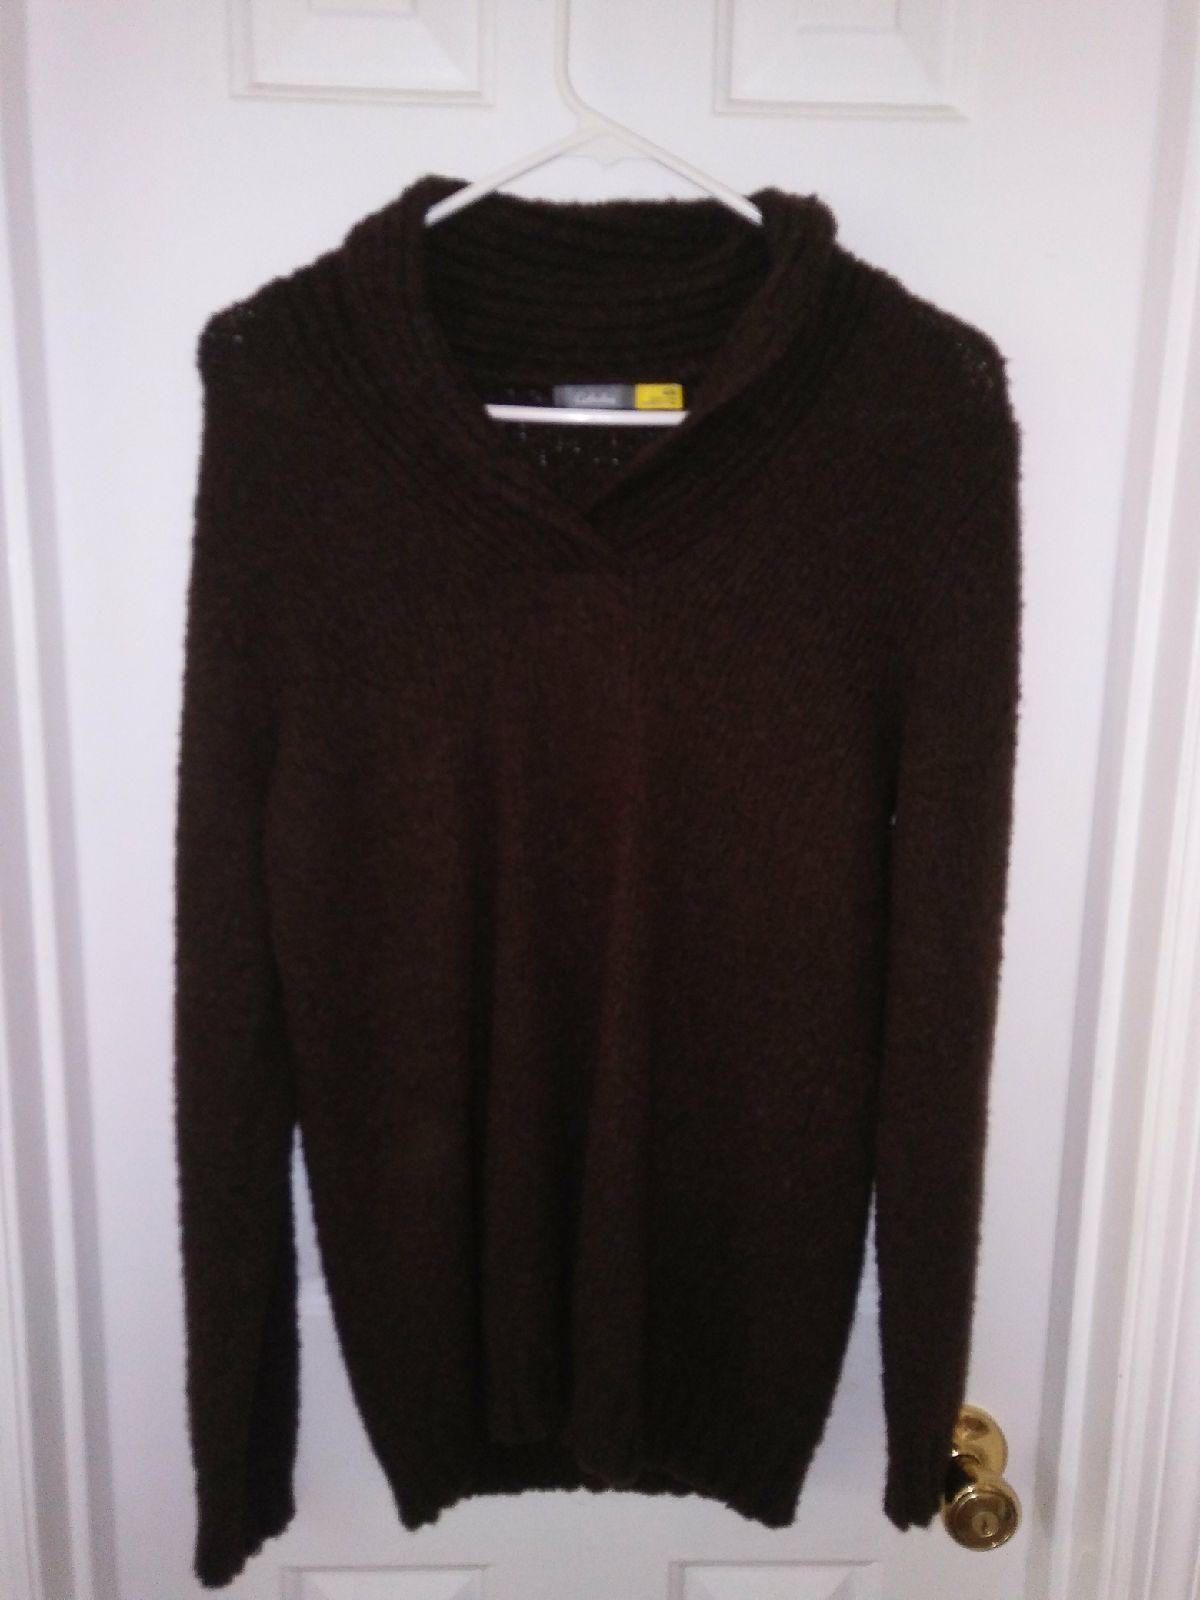 Cabelas chocolate brown sweater - Mercari: BUY & SELL THINGS YOU LOVE